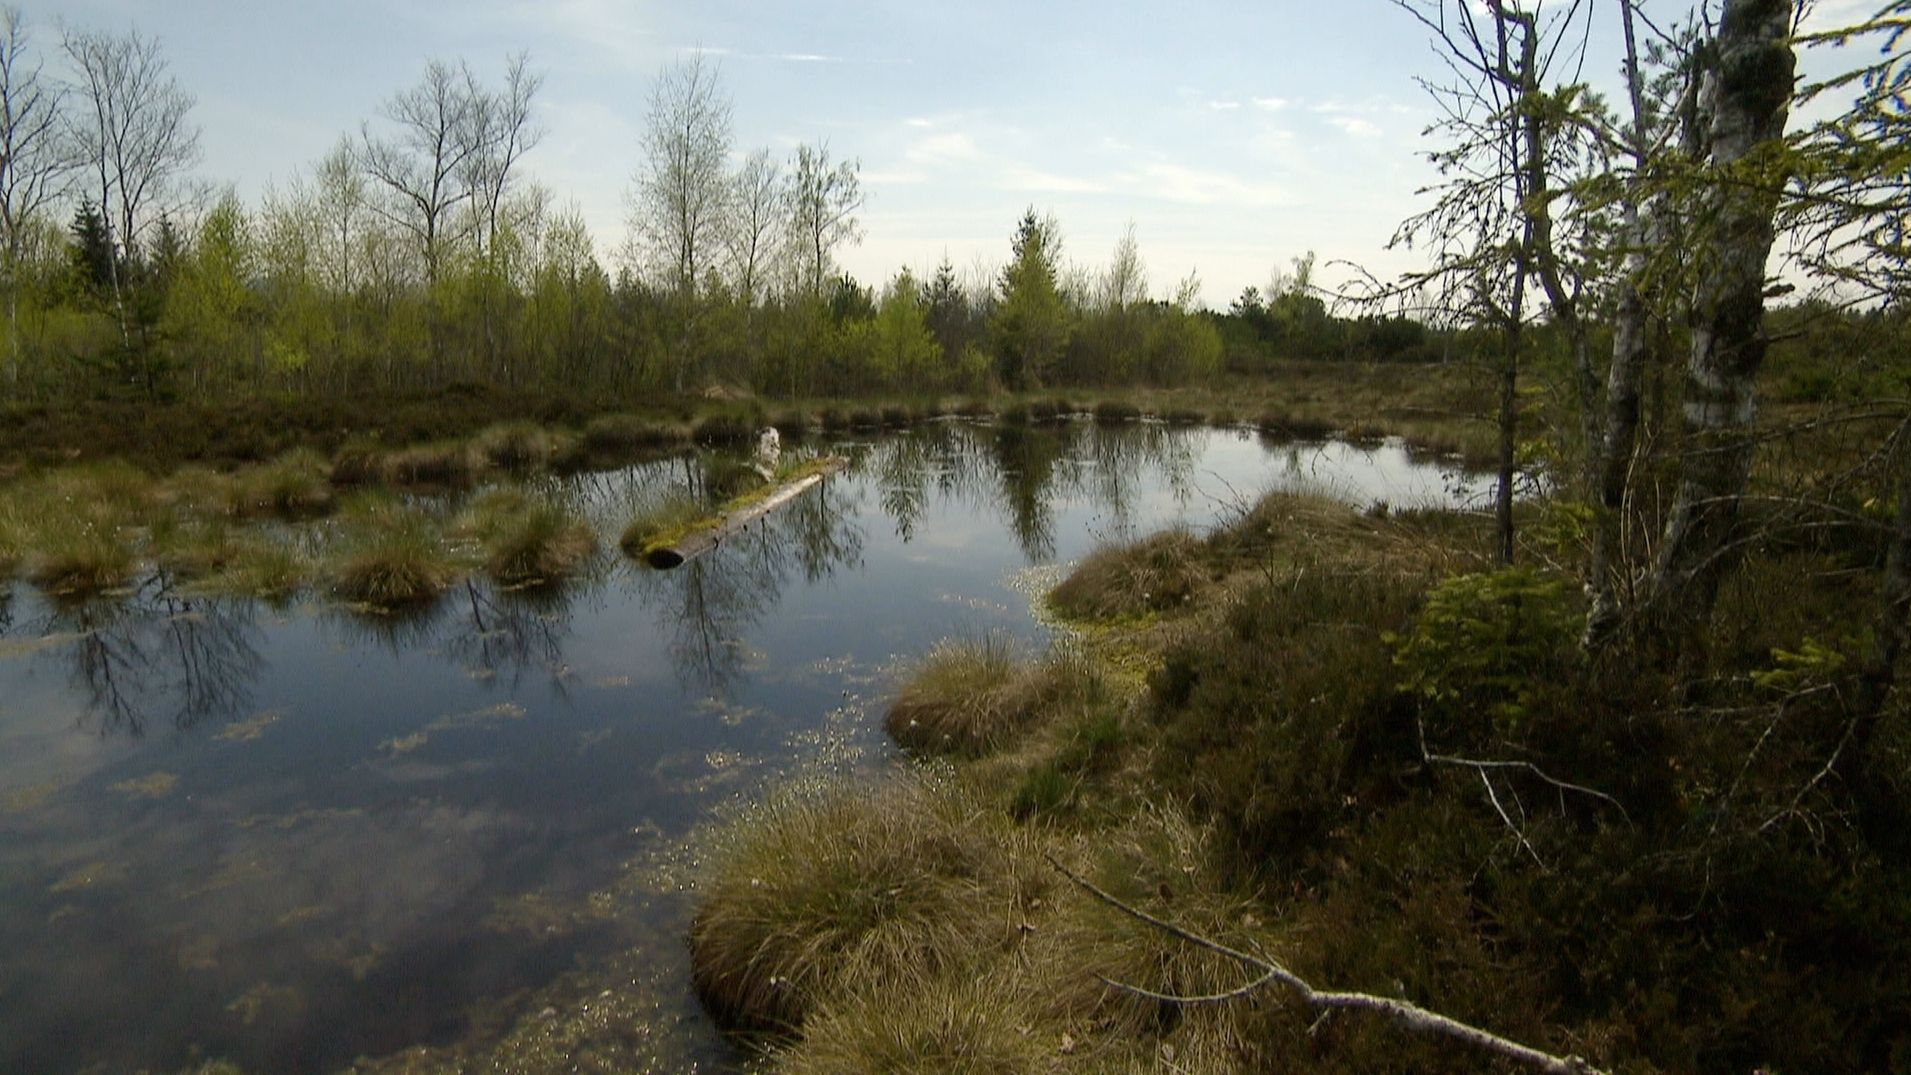 Naturschutzgebiet Wenger Moor im Salzburger Land